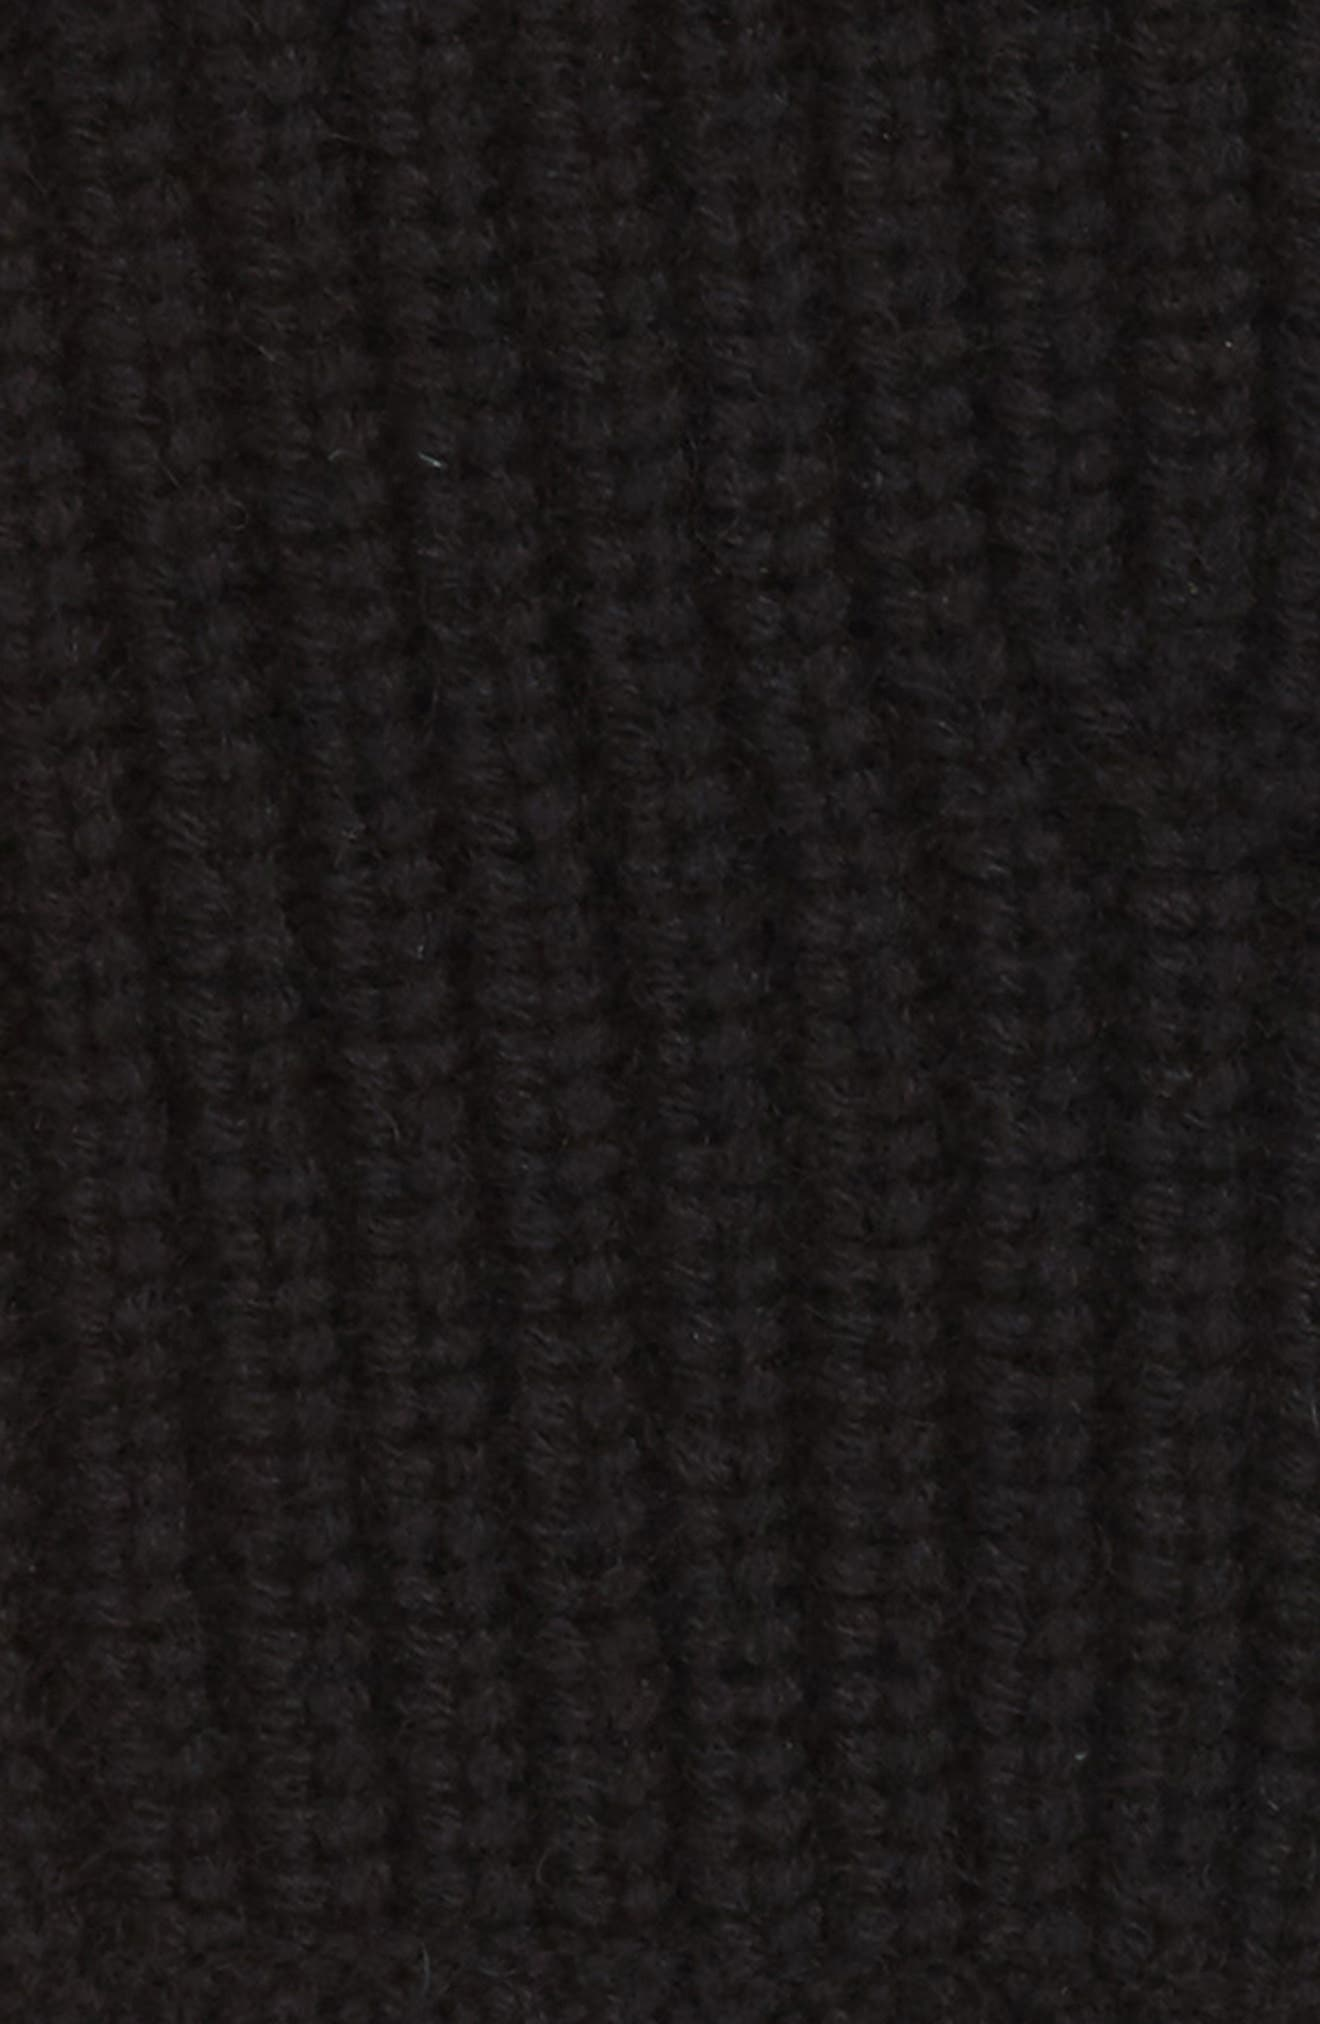 Ace Cashmere Knit Fingerless Gloves,                             Alternate thumbnail 2, color,                             Black